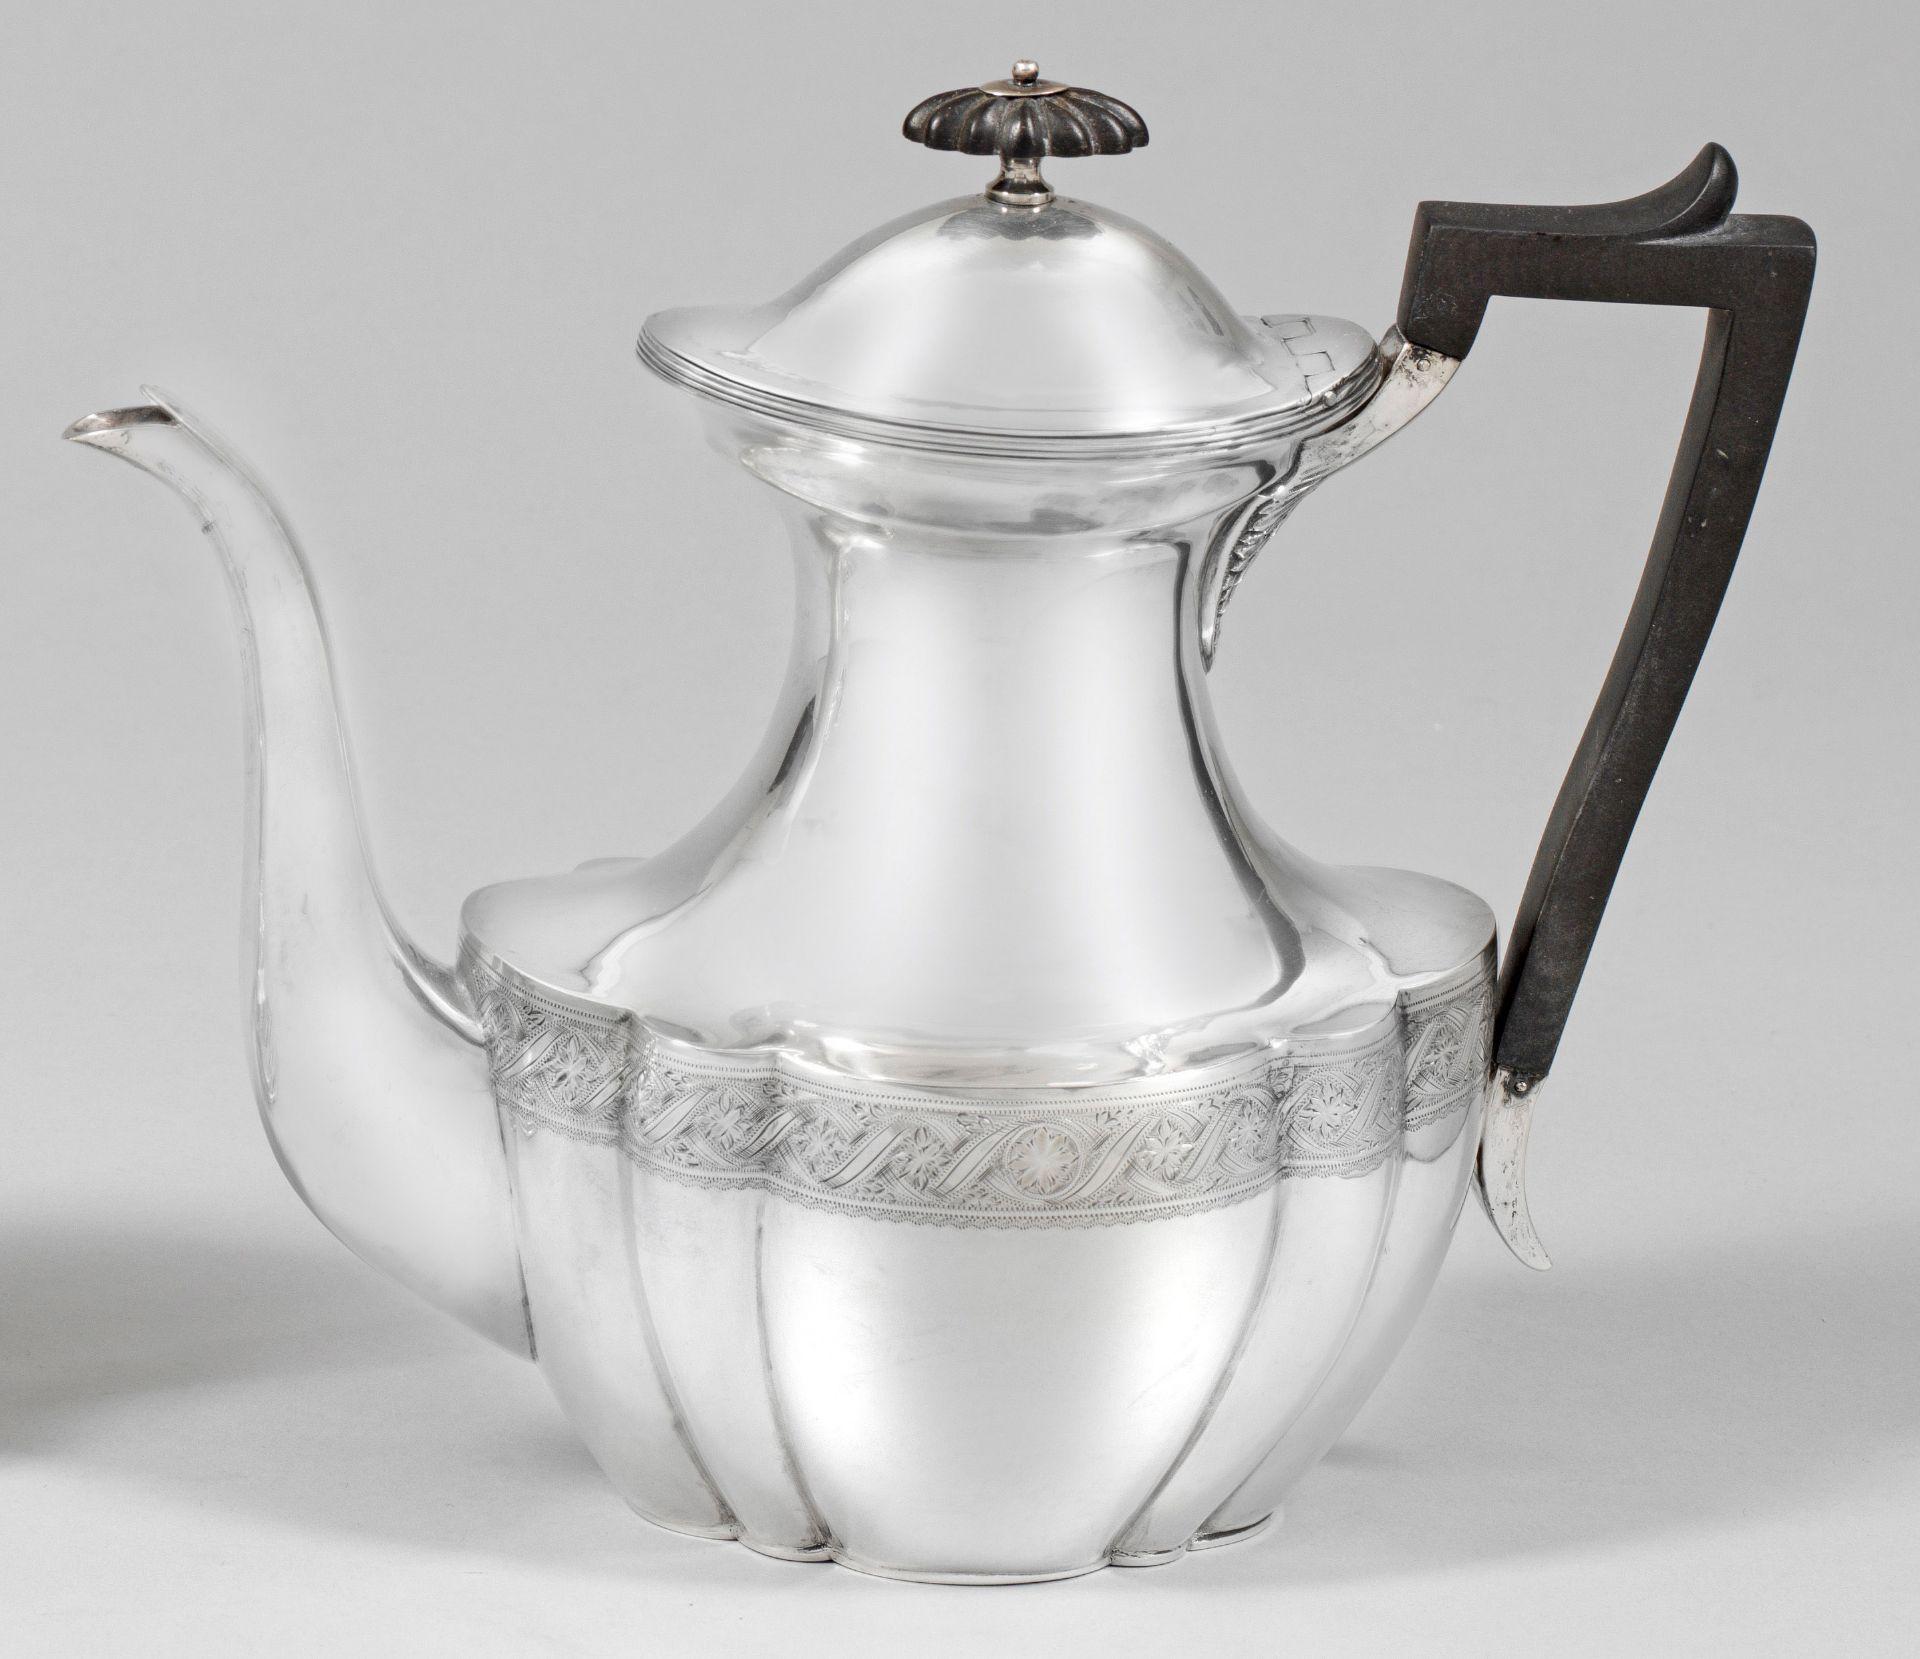 Viktorianische Teekanne